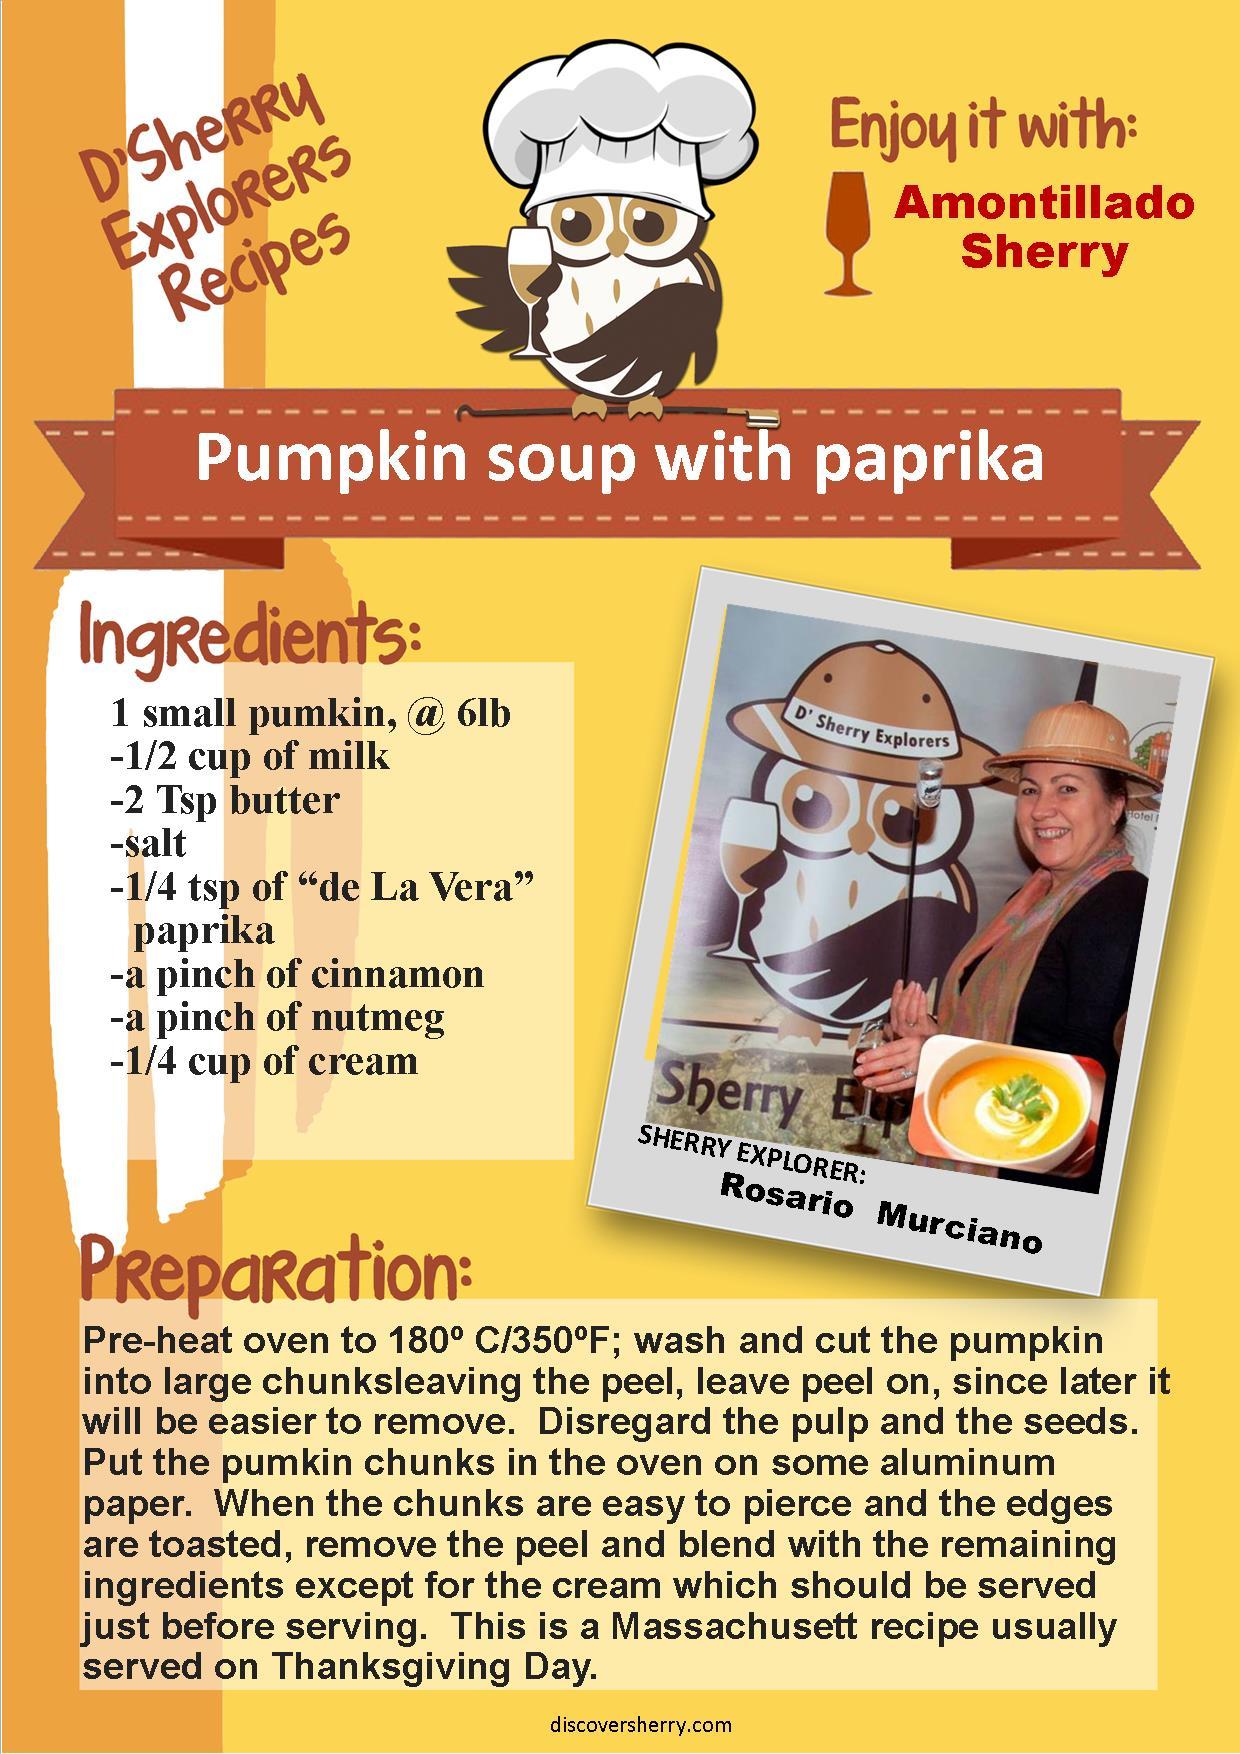 D´Sherry Explorers´recipe: Pumkin soup with paprika. Crema de calabaza conpimentón.